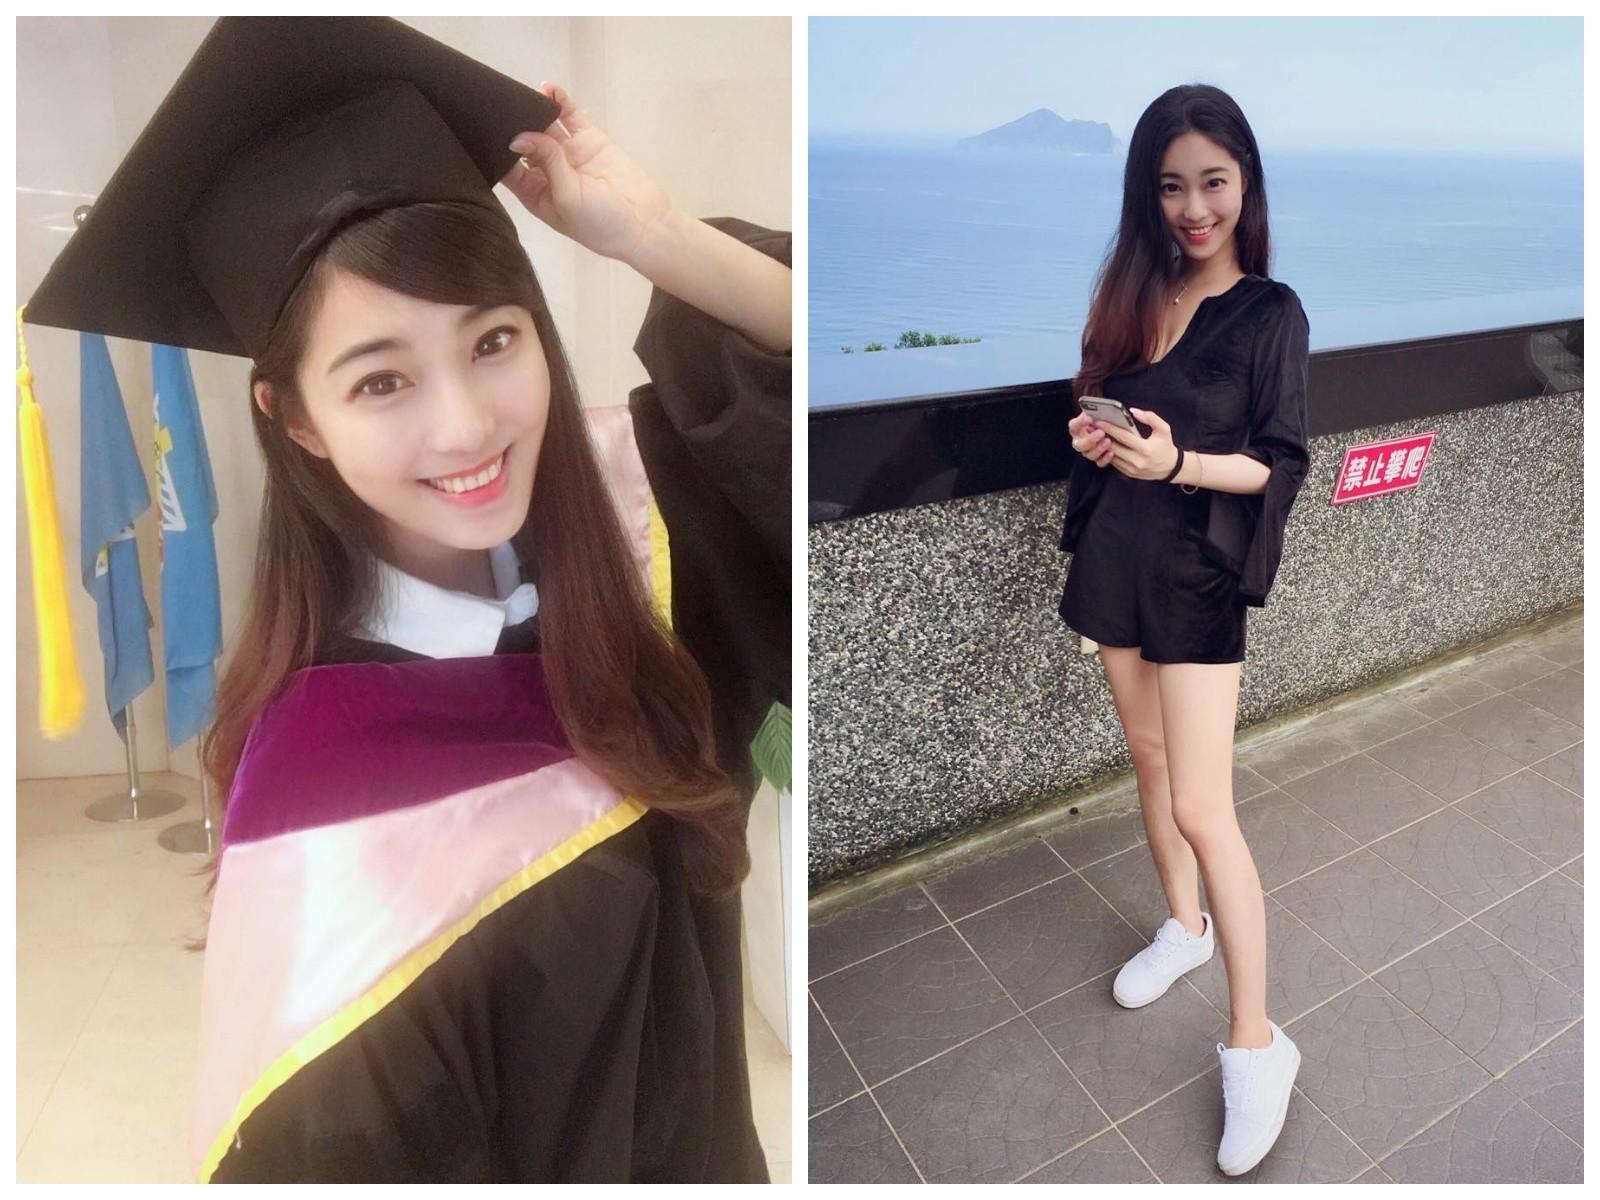 Фото: instagram/jhiawen.cheng